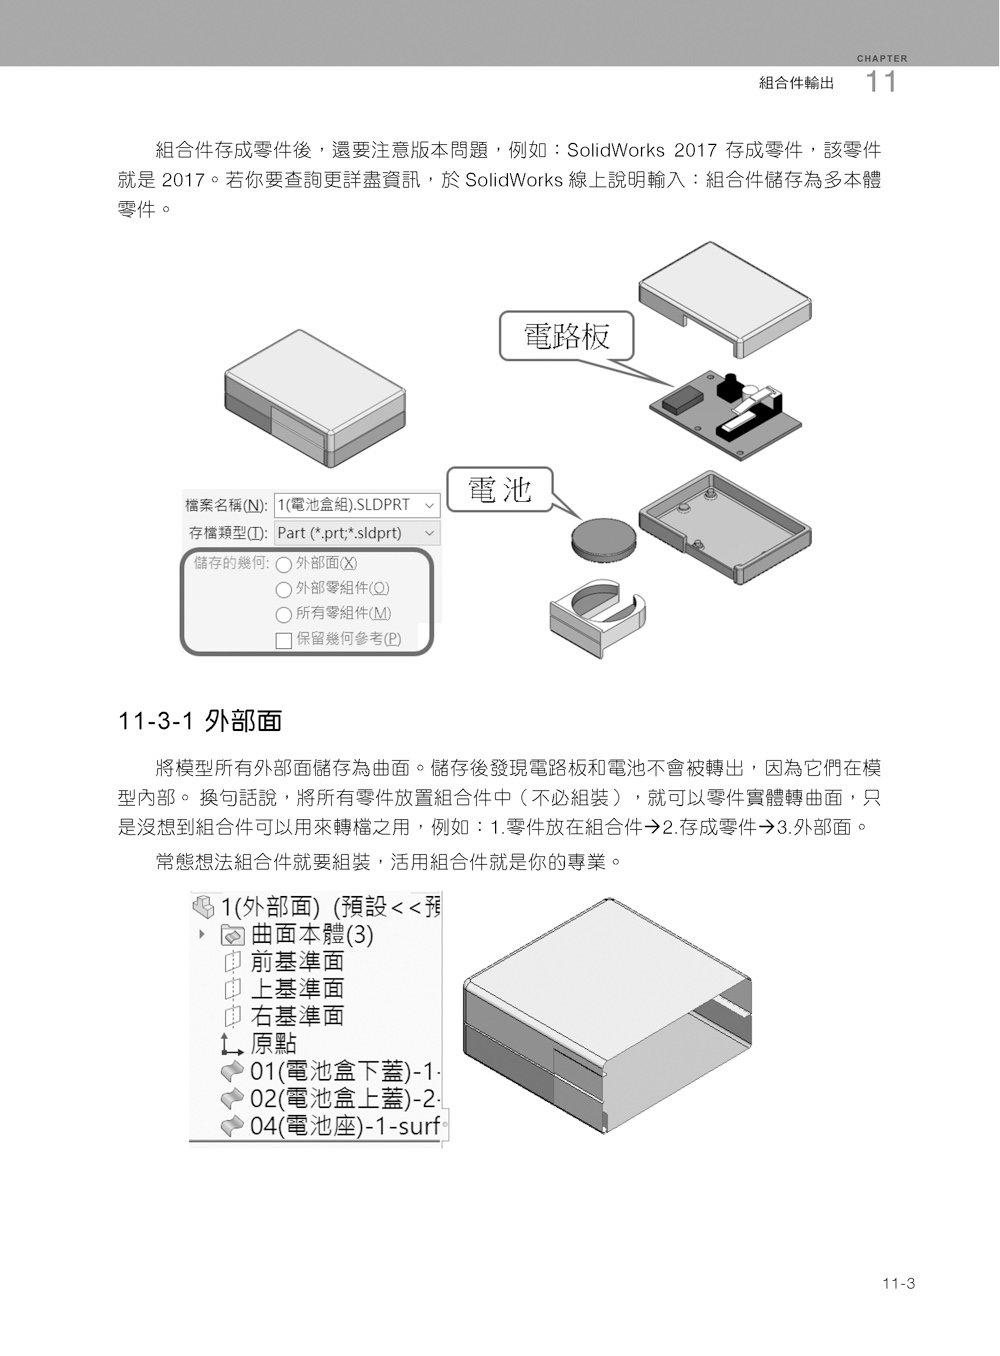 Solidworks 專業工程師訓練手冊[9]-模型轉檔與修復策略-preview-11